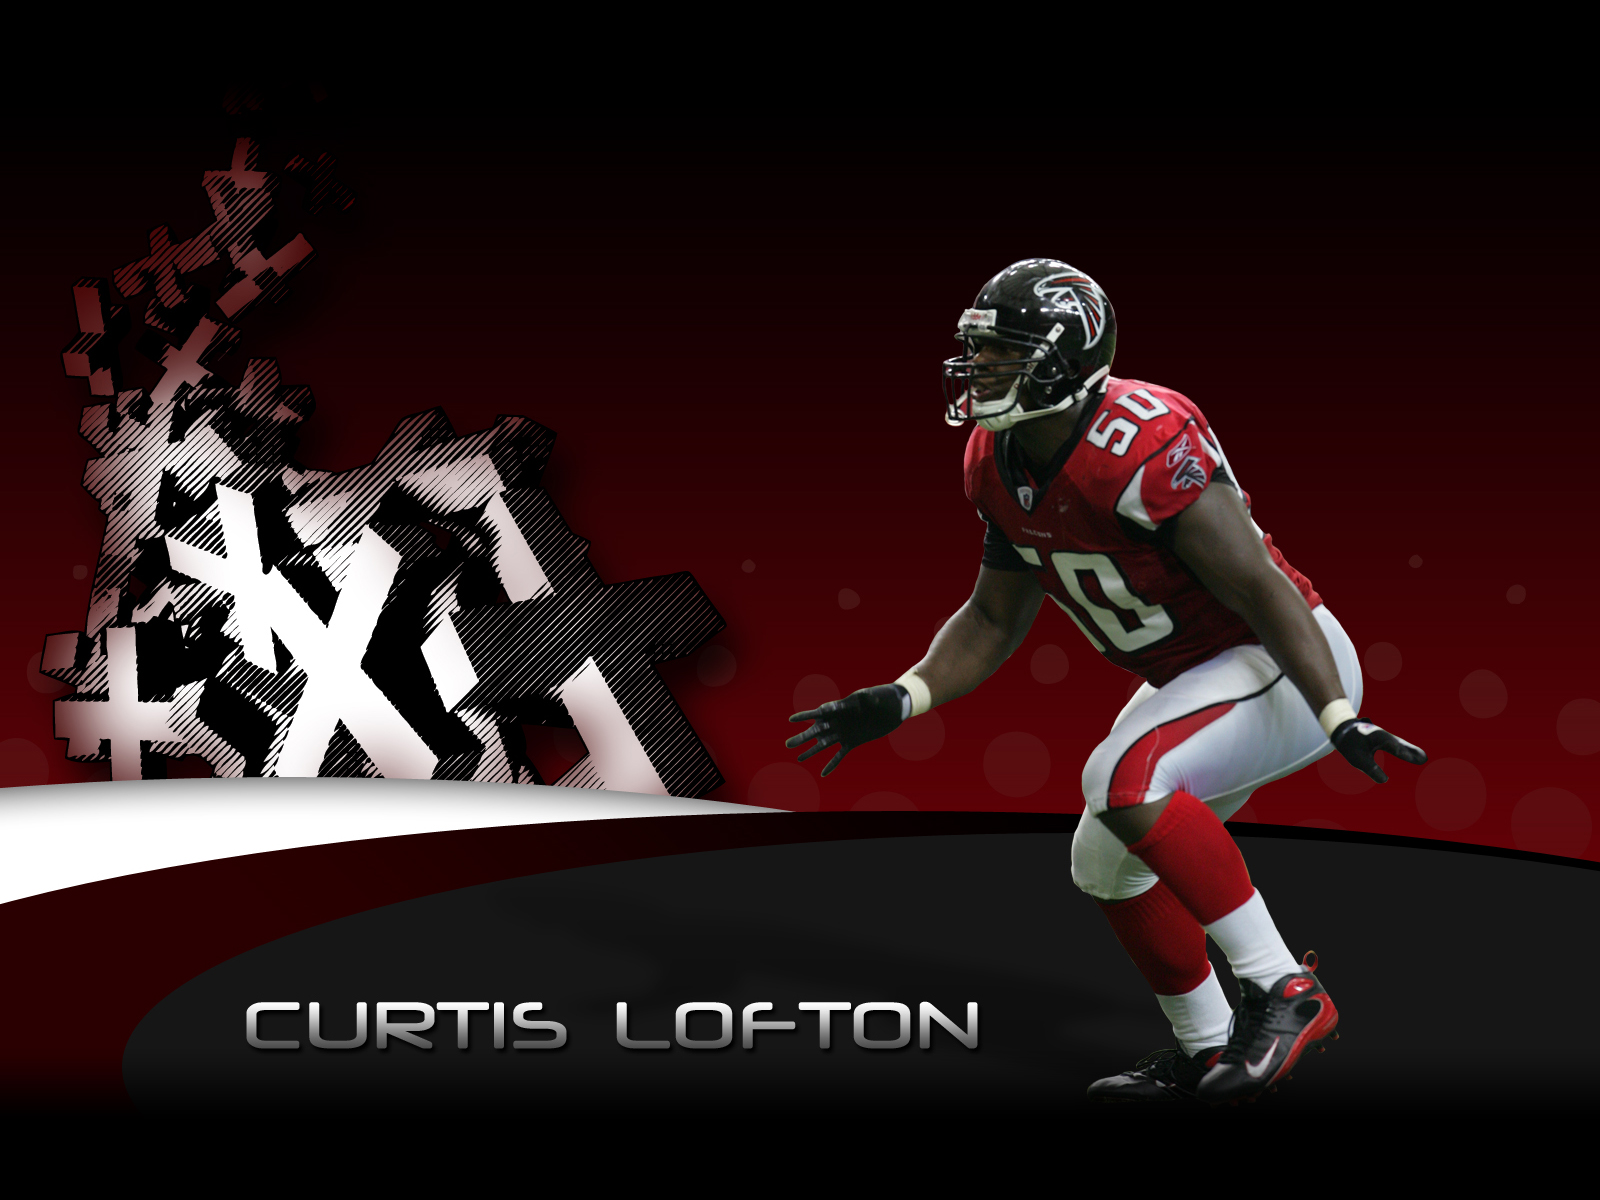 http://2.bp.blogspot.com/_SswvbuGR3Zo/TTIJ0V3ELDI/AAAAAAAAAi8/UBMDgZa9aOQ/s1600/Atlanta+Curtis+Lofton.jpg